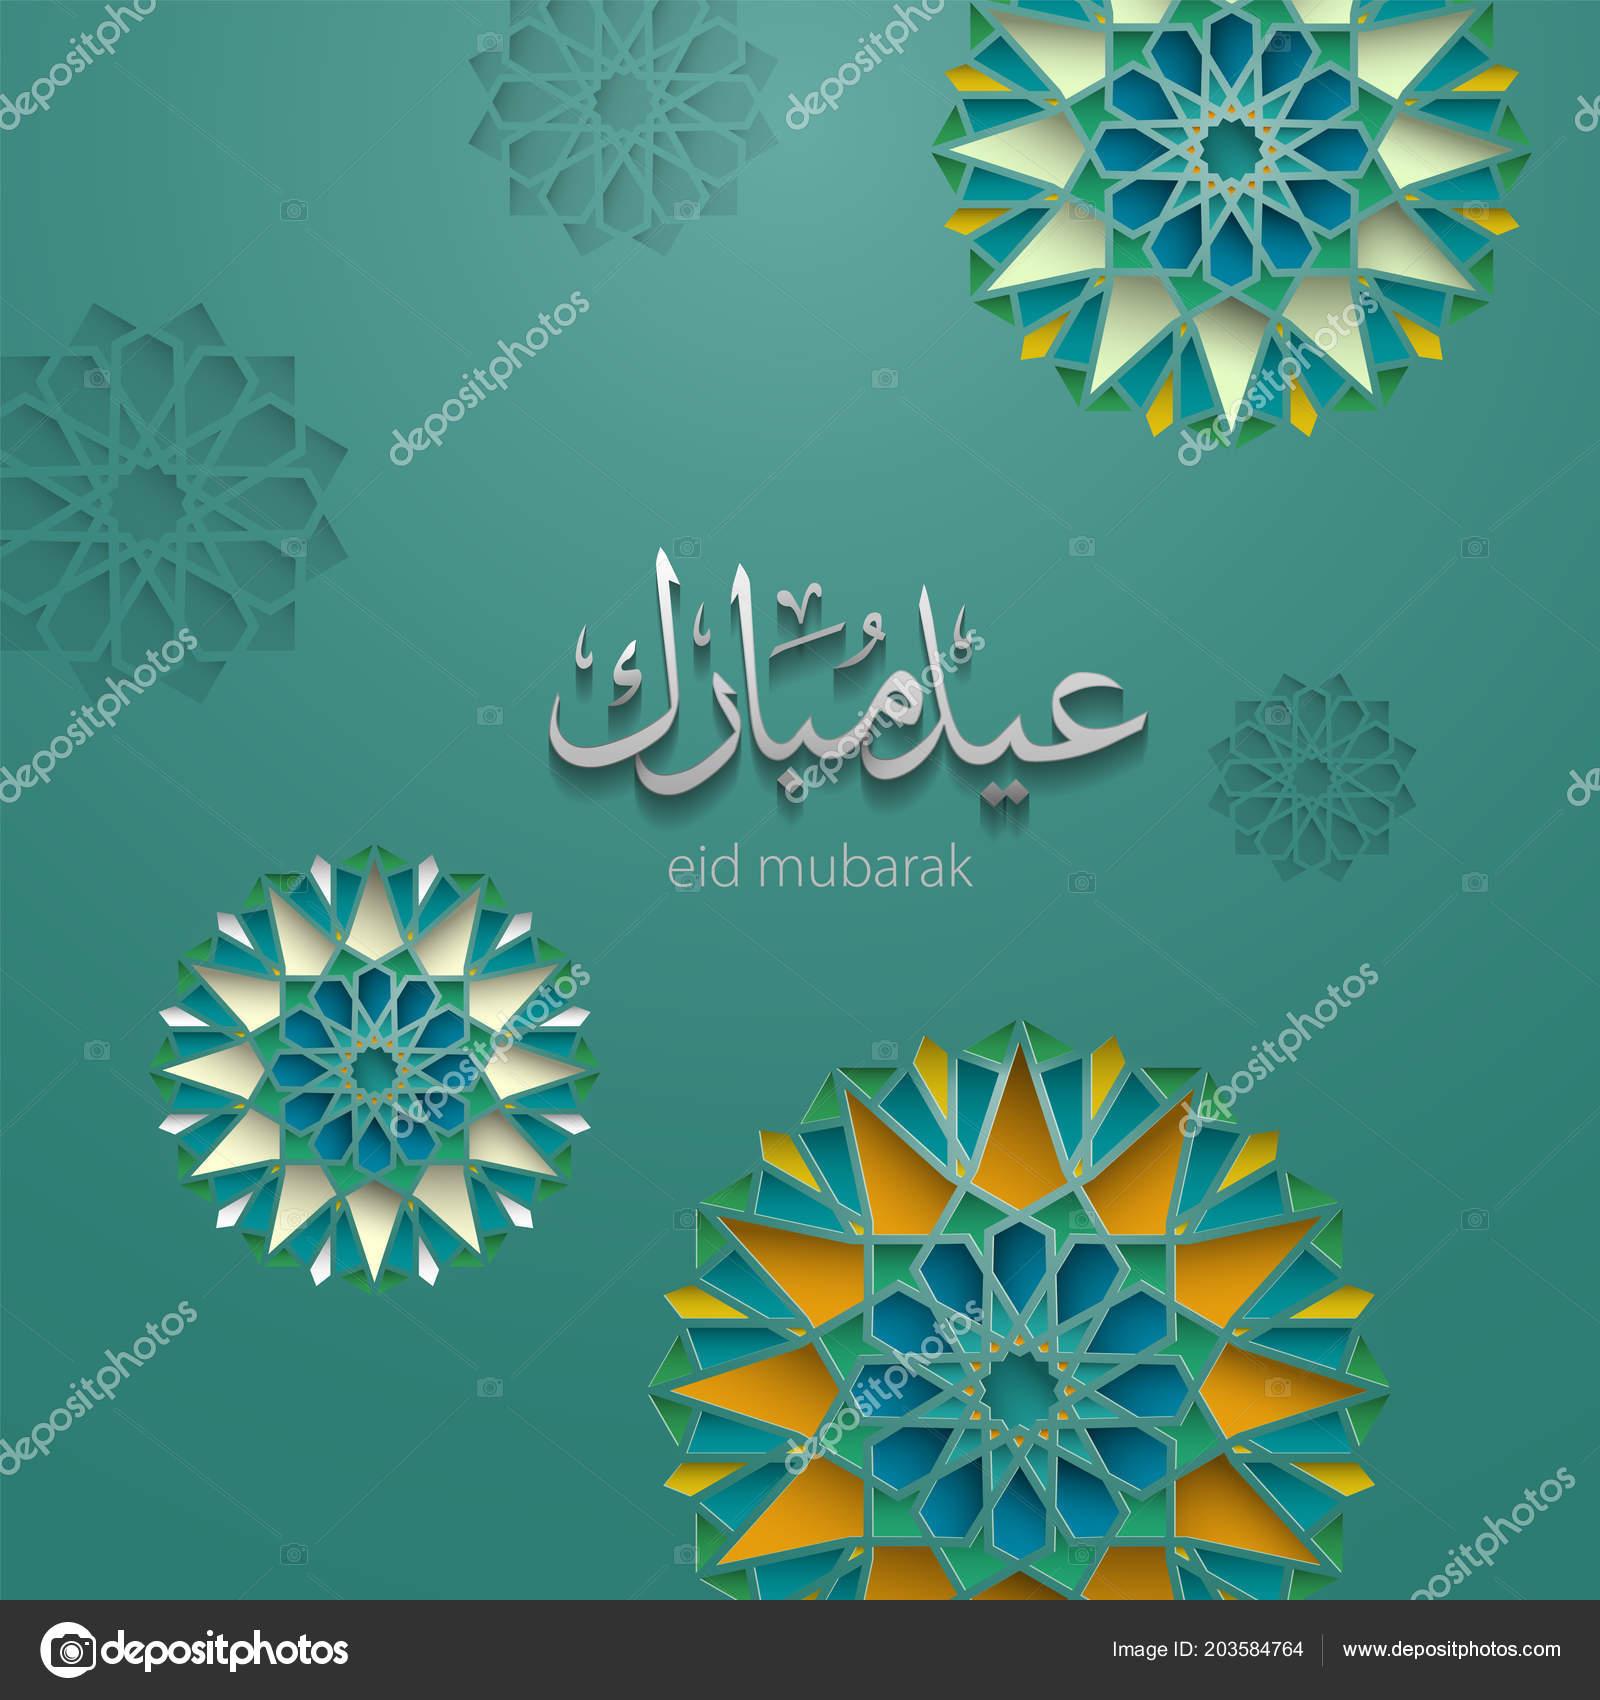 Eid Mubarak Arabic Calligraphy Means Celebration Blessed Suitable